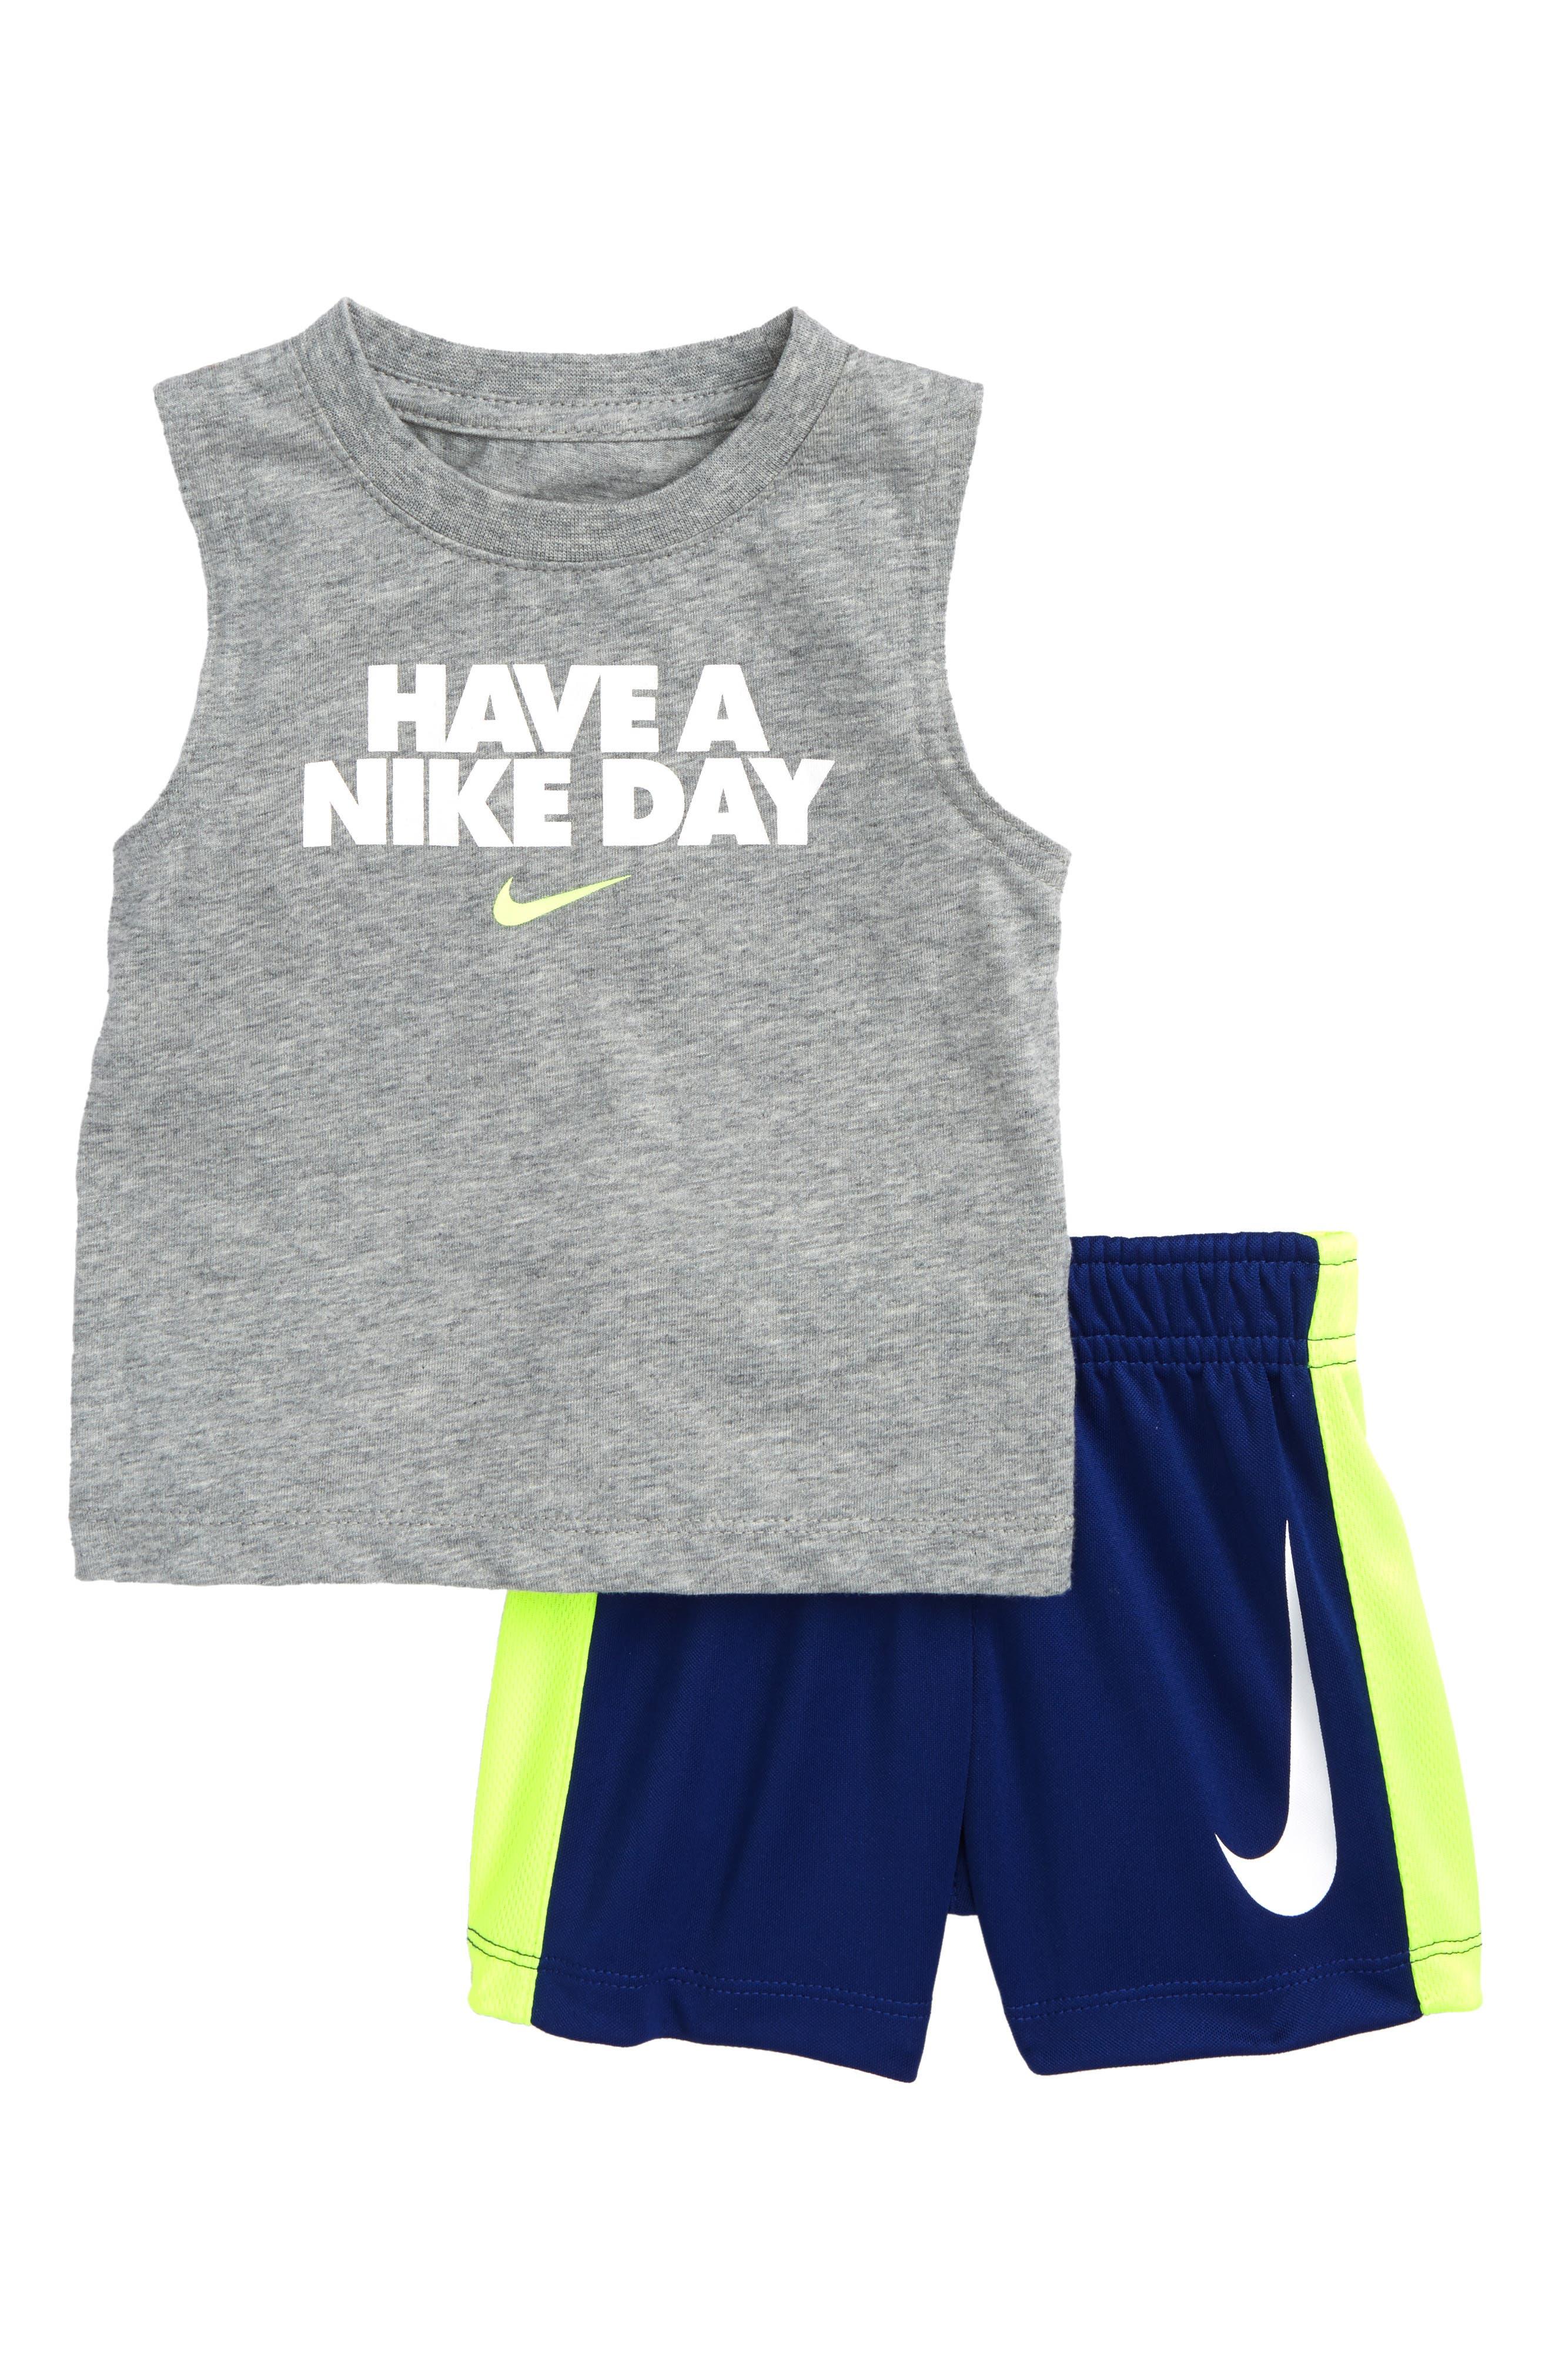 Main Image - Nike Have a Nike Day Tank Top & Shorts Set (Baby Boys)